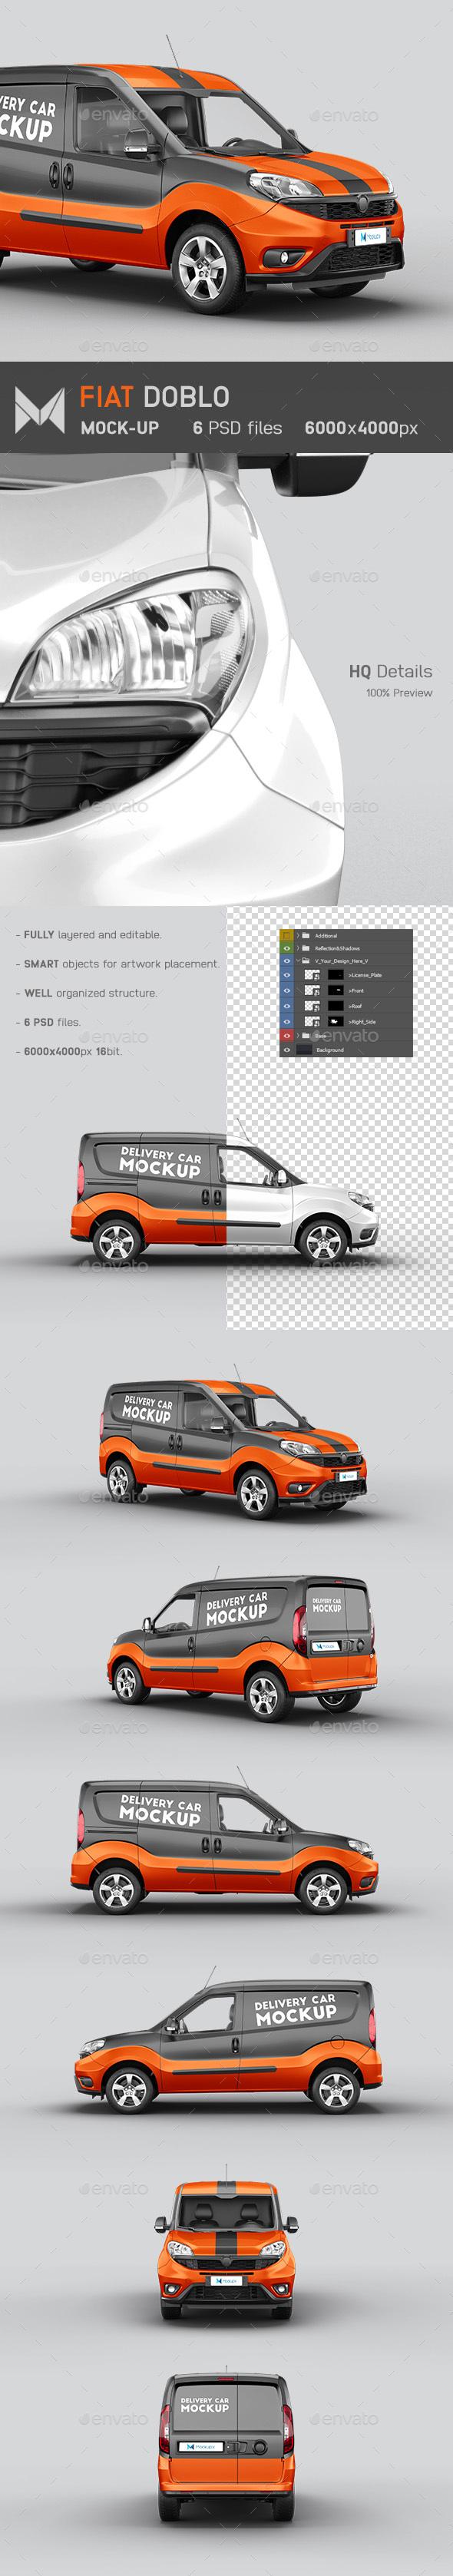 Fiat Doblo Delivery Car Mockup By Mockupix Graphicriver